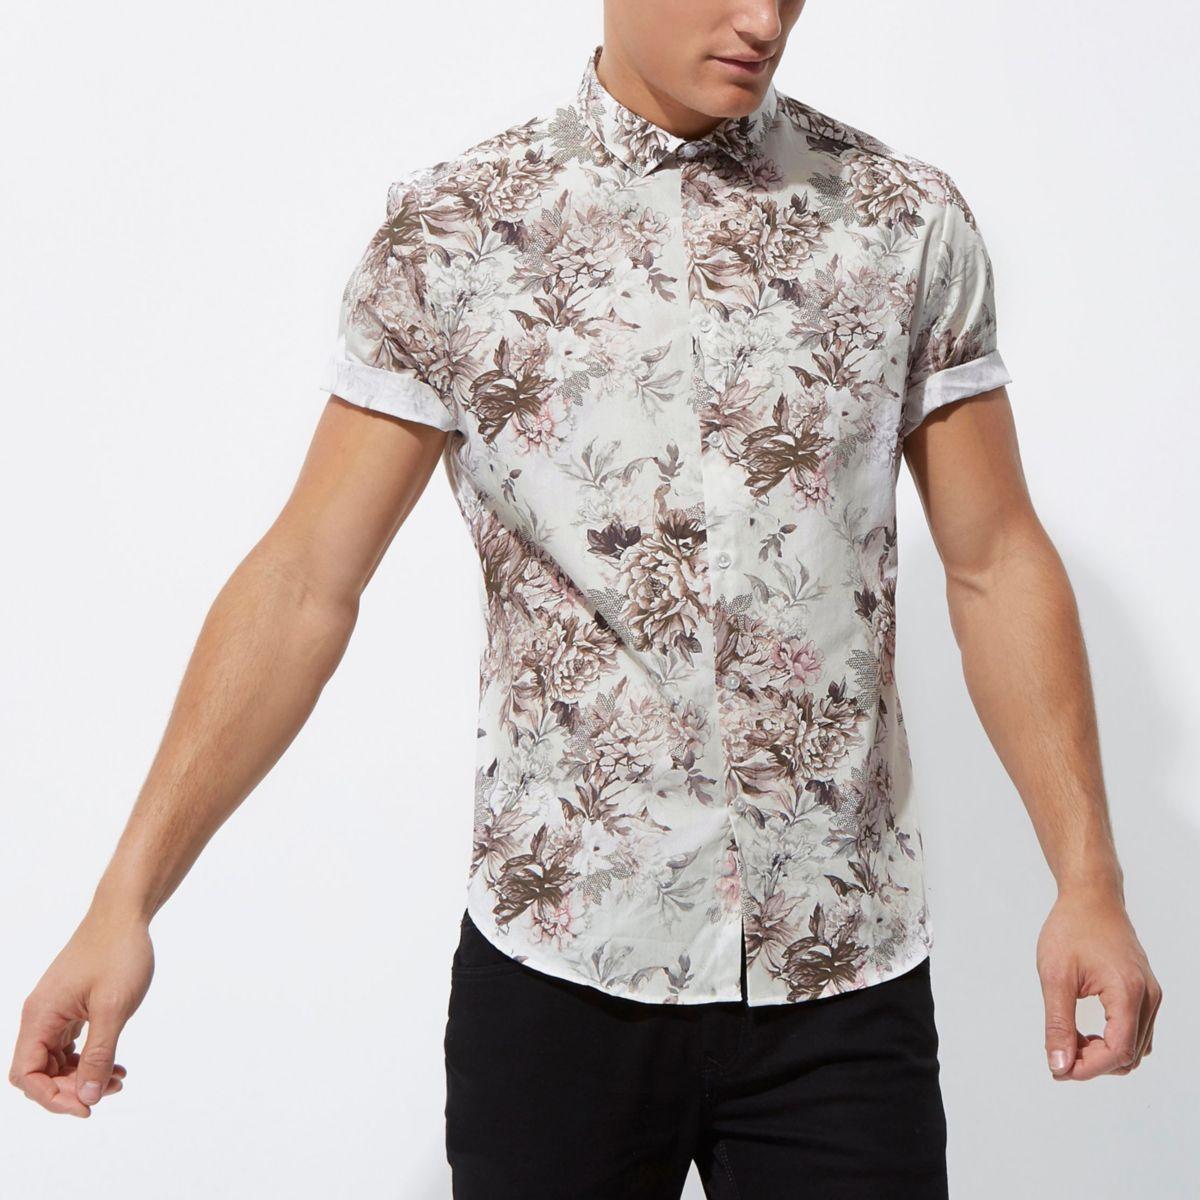 Cream floral short sleeve slim fit shirt shirts sale men for Mens short sleeve floral shirt